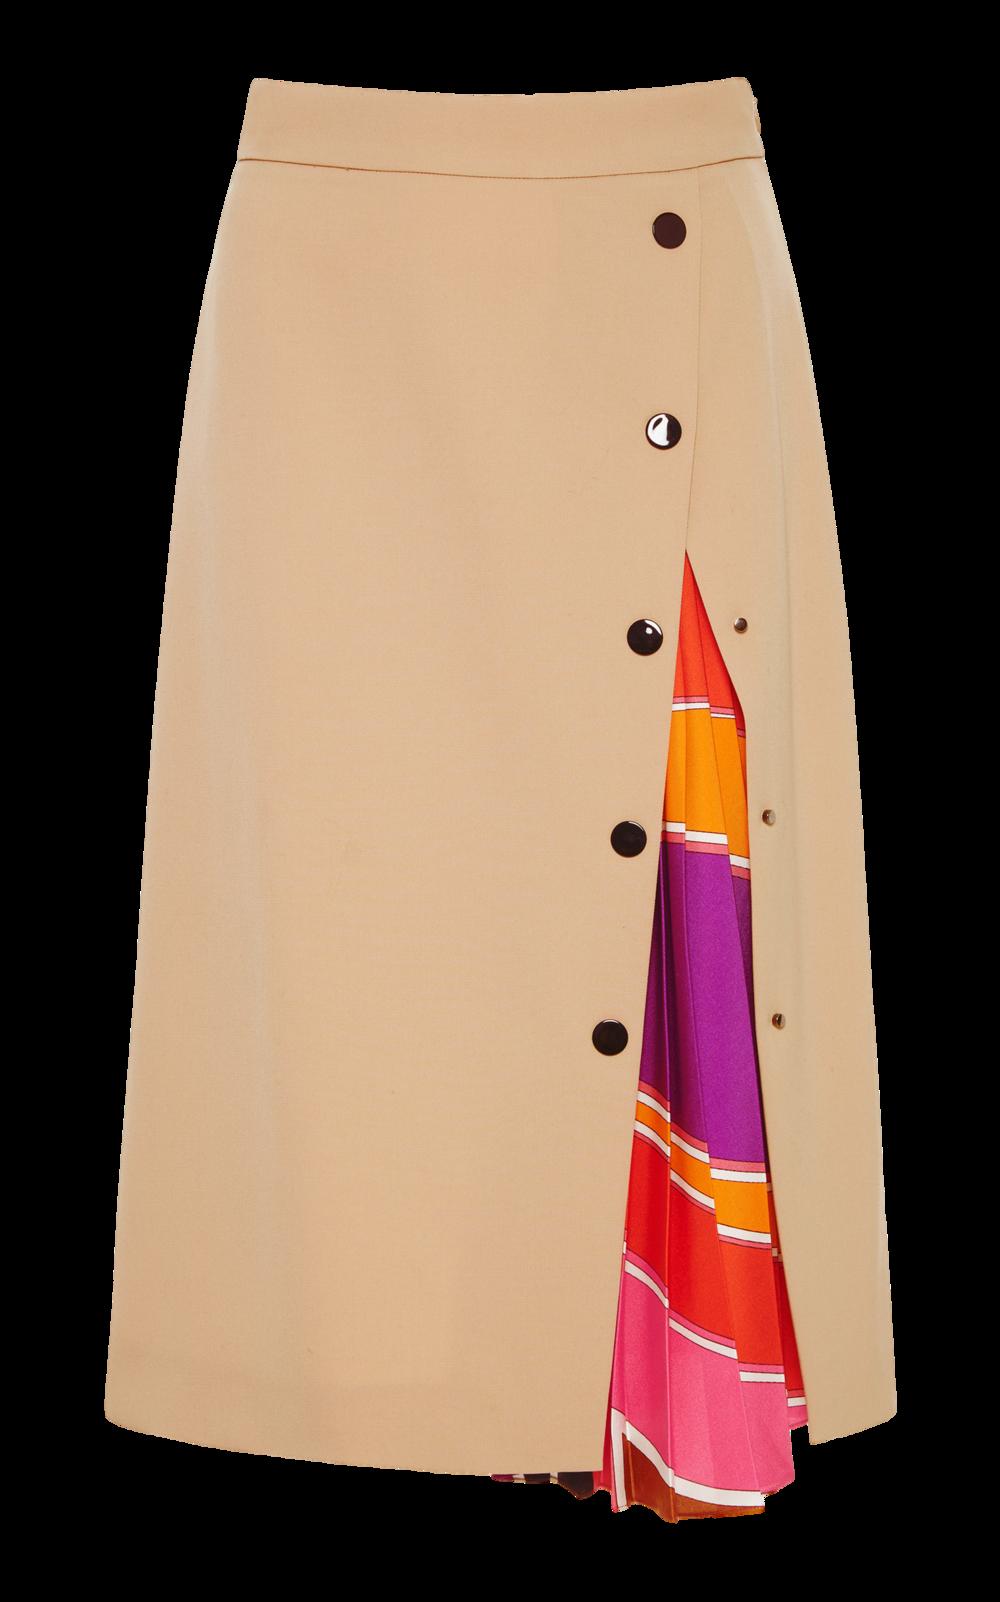 https-__www.modaoperandi.com_emilio-pucci-pf17_a-line-skirt_clipped_rev_1.png